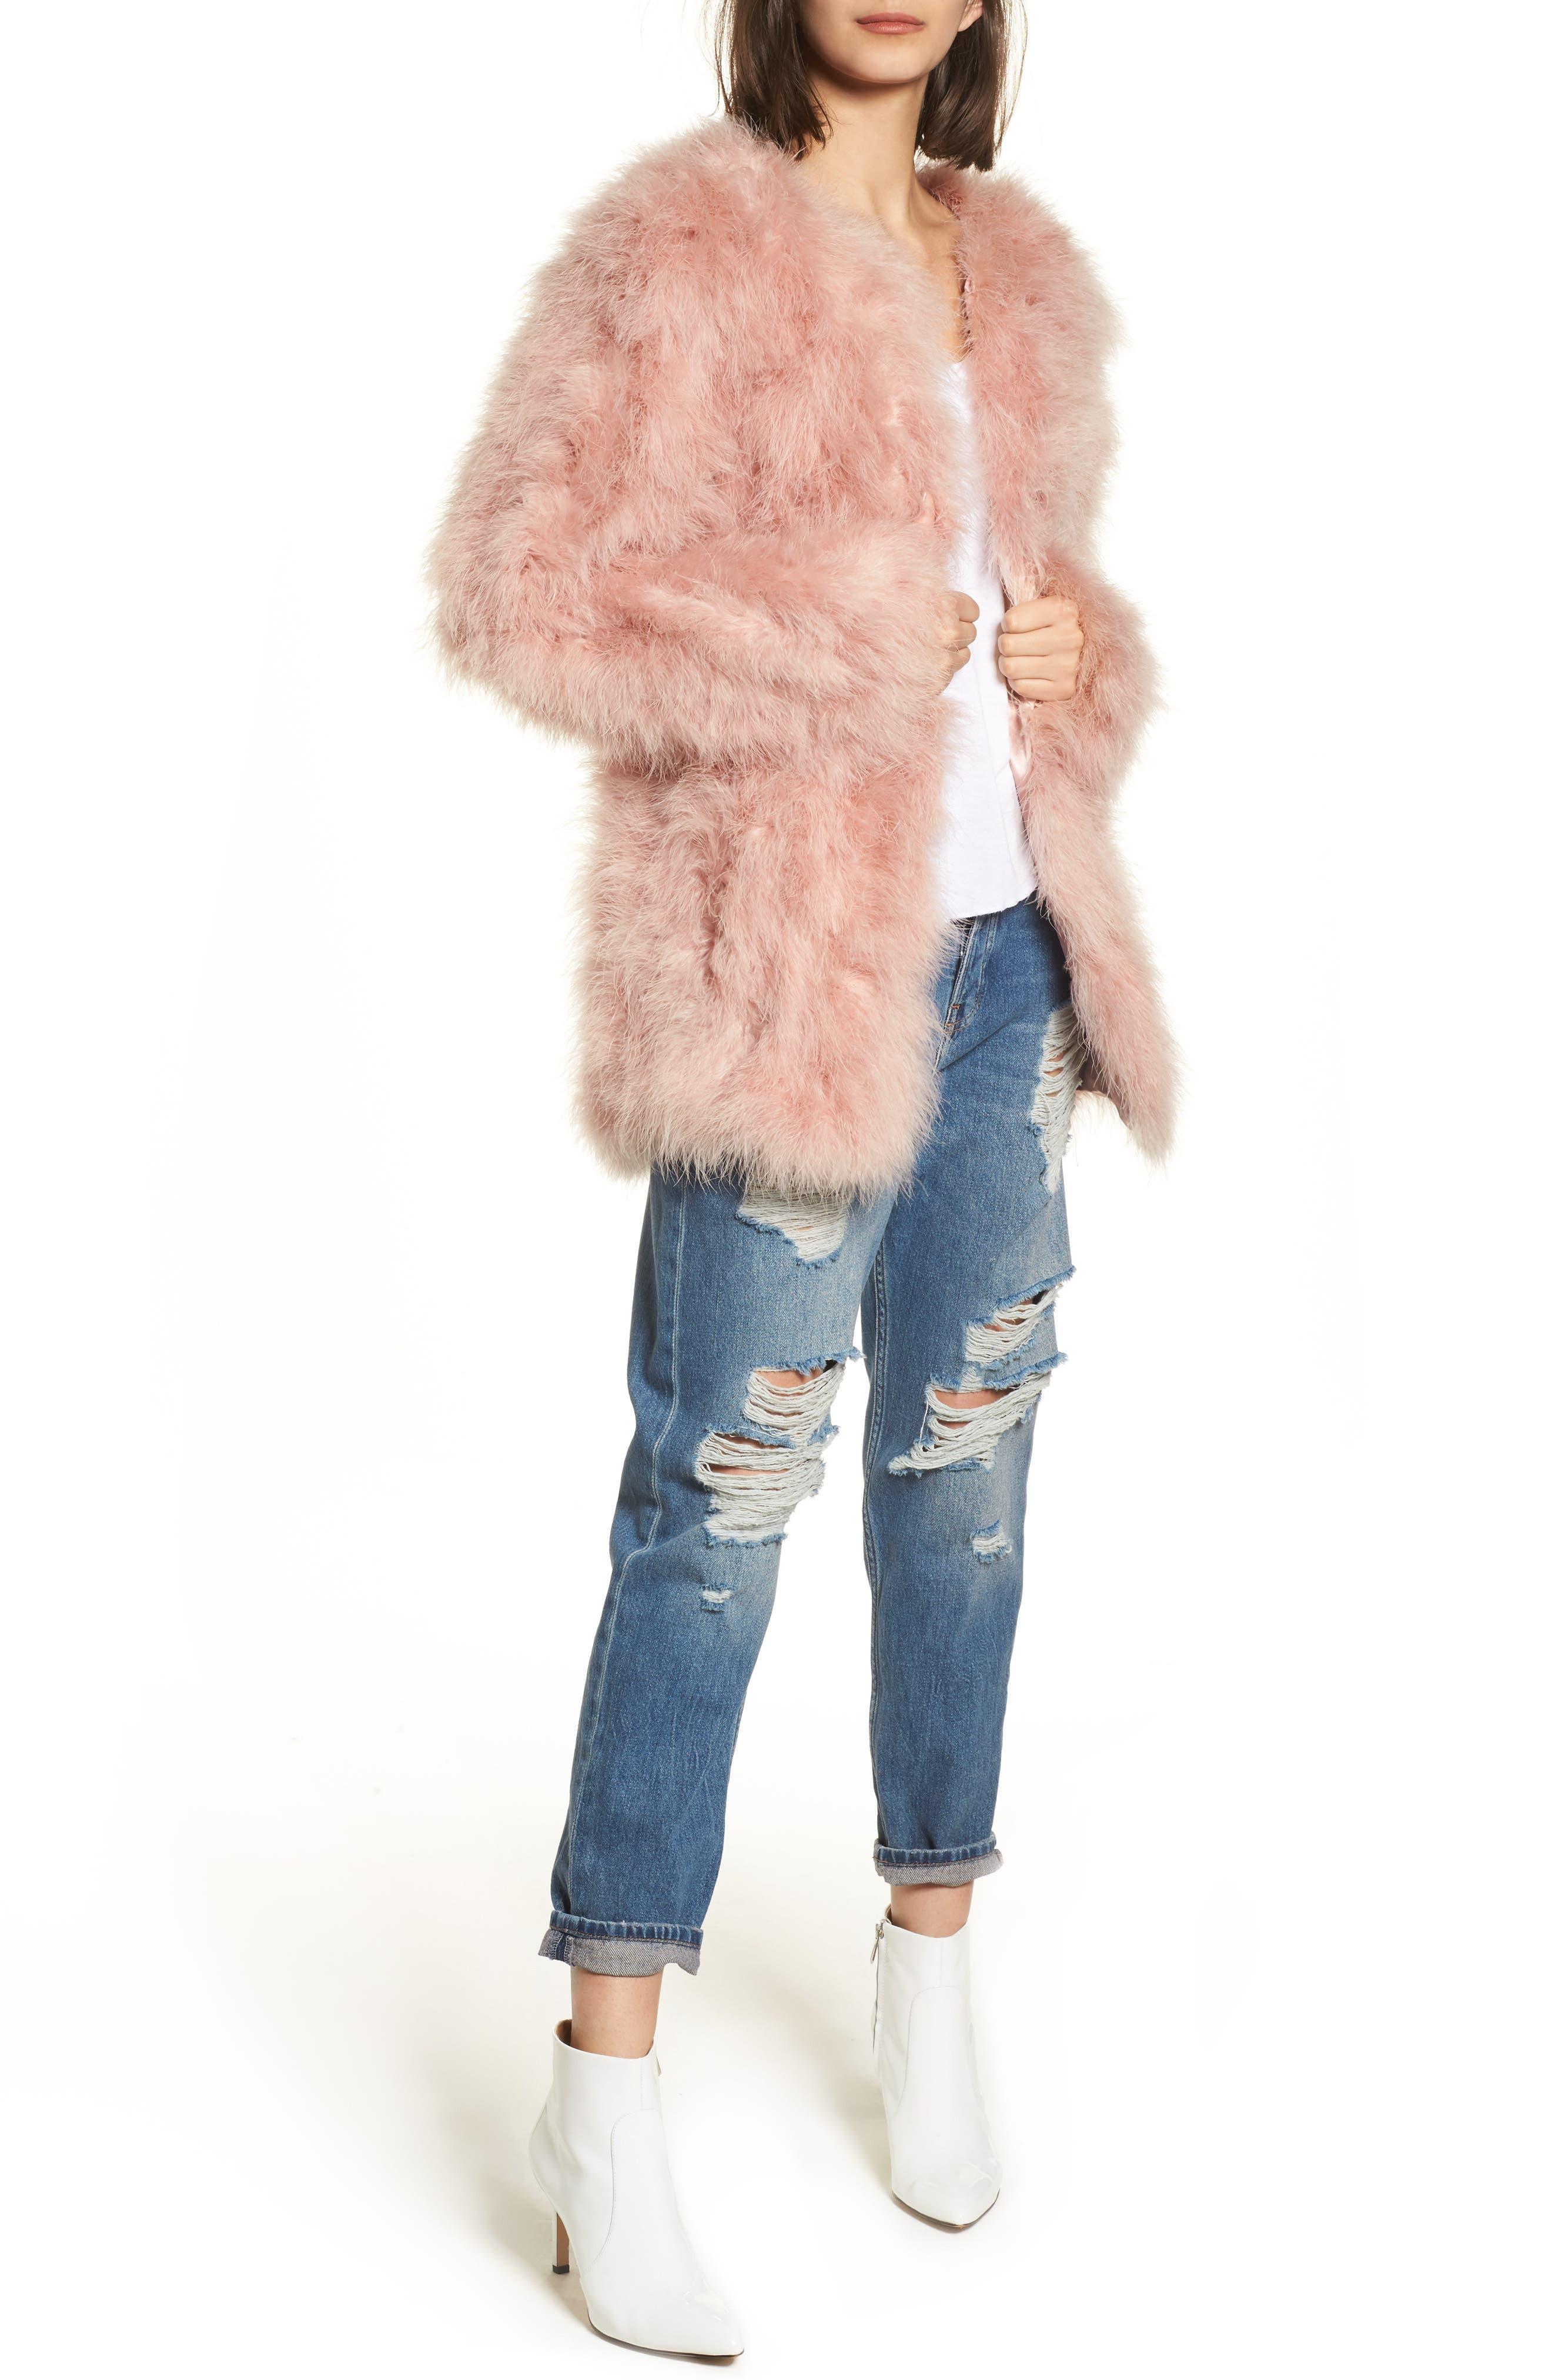 Topshop Longline Marabou Feather Jacket